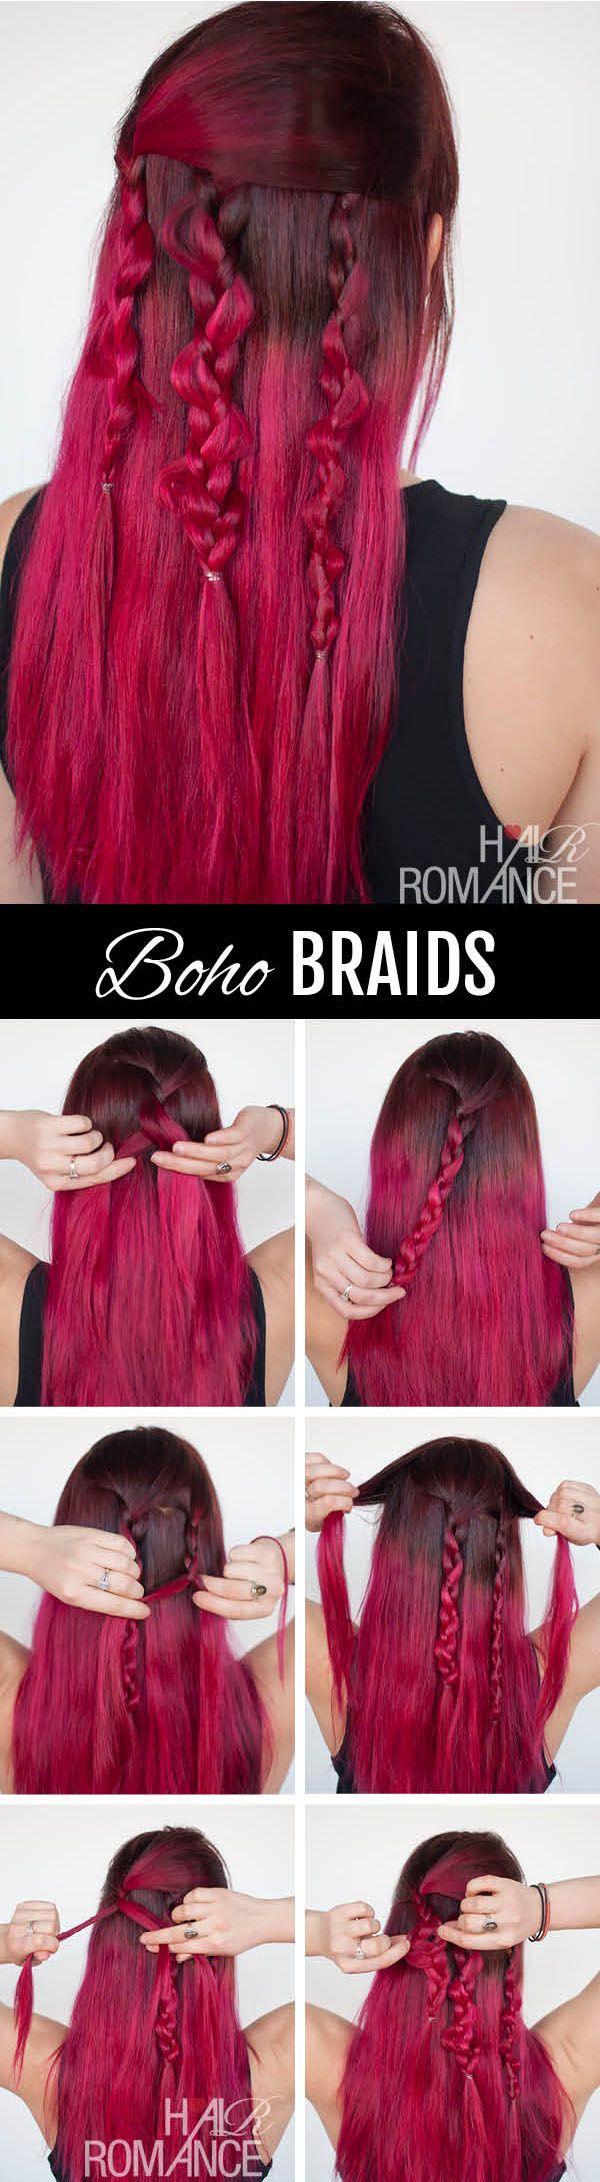 Hair romance the boho braids tutorial hair ideas pinterest